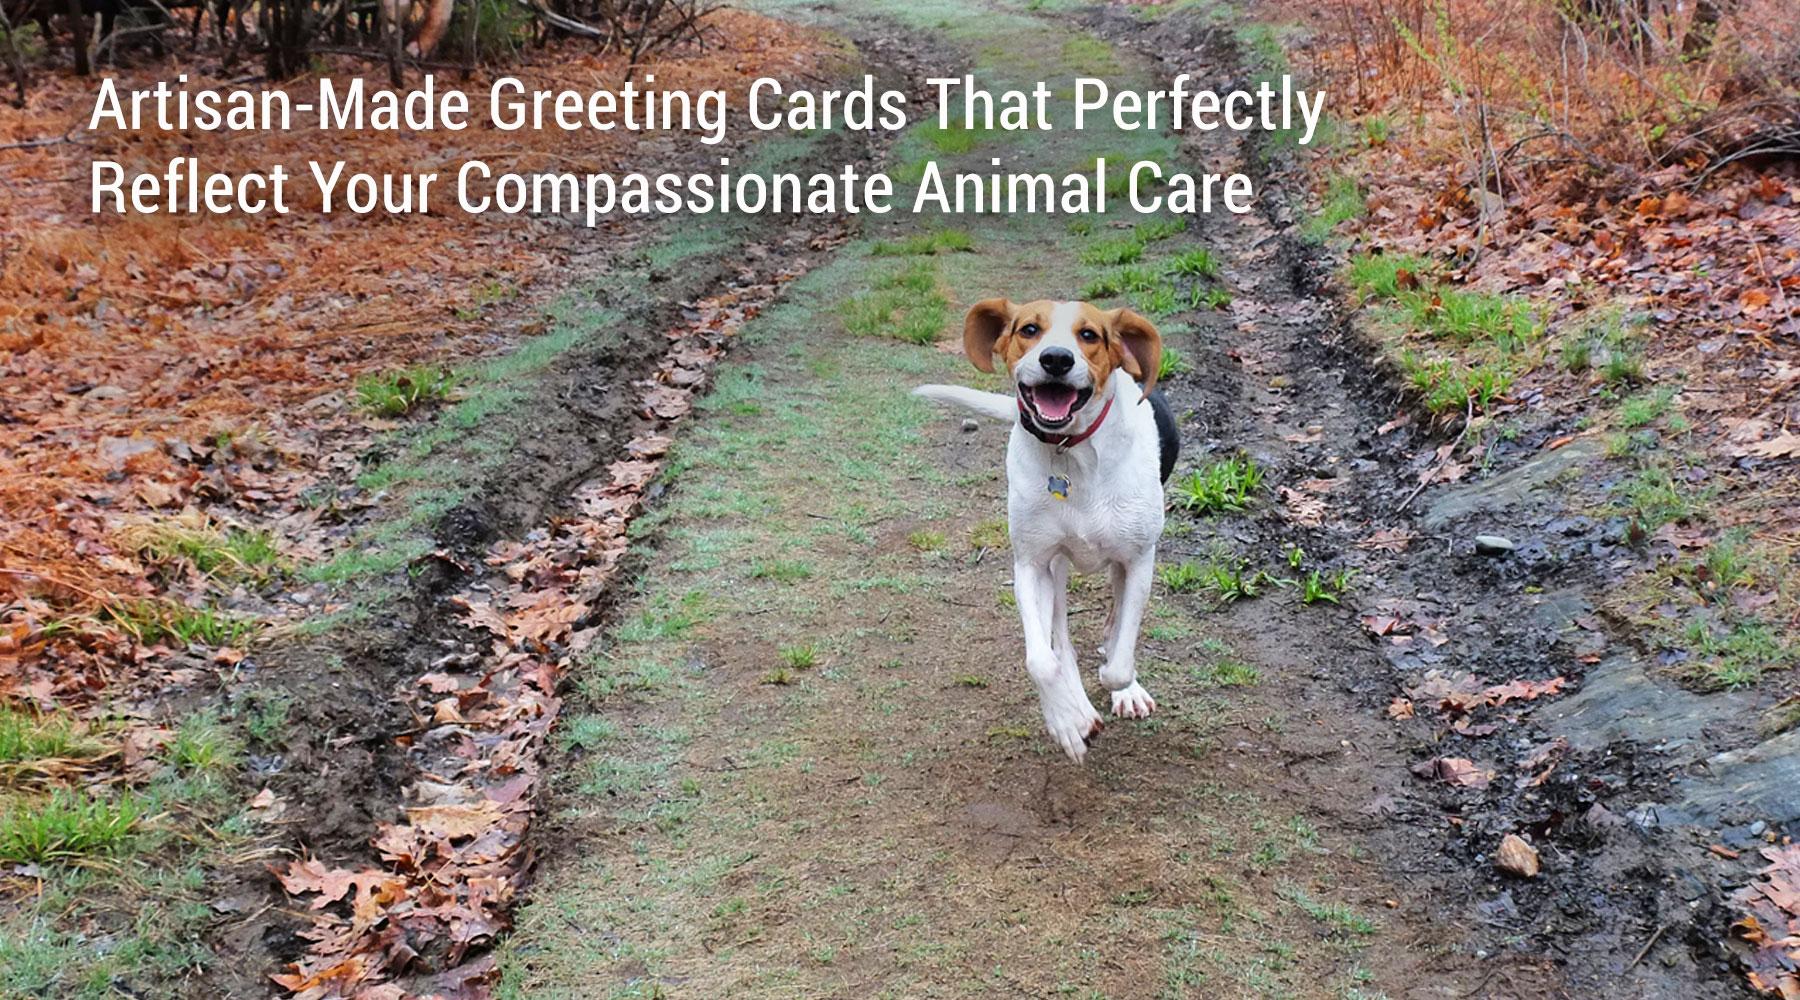 cards for animal condolence, sympathy, gratitude and holiday designs